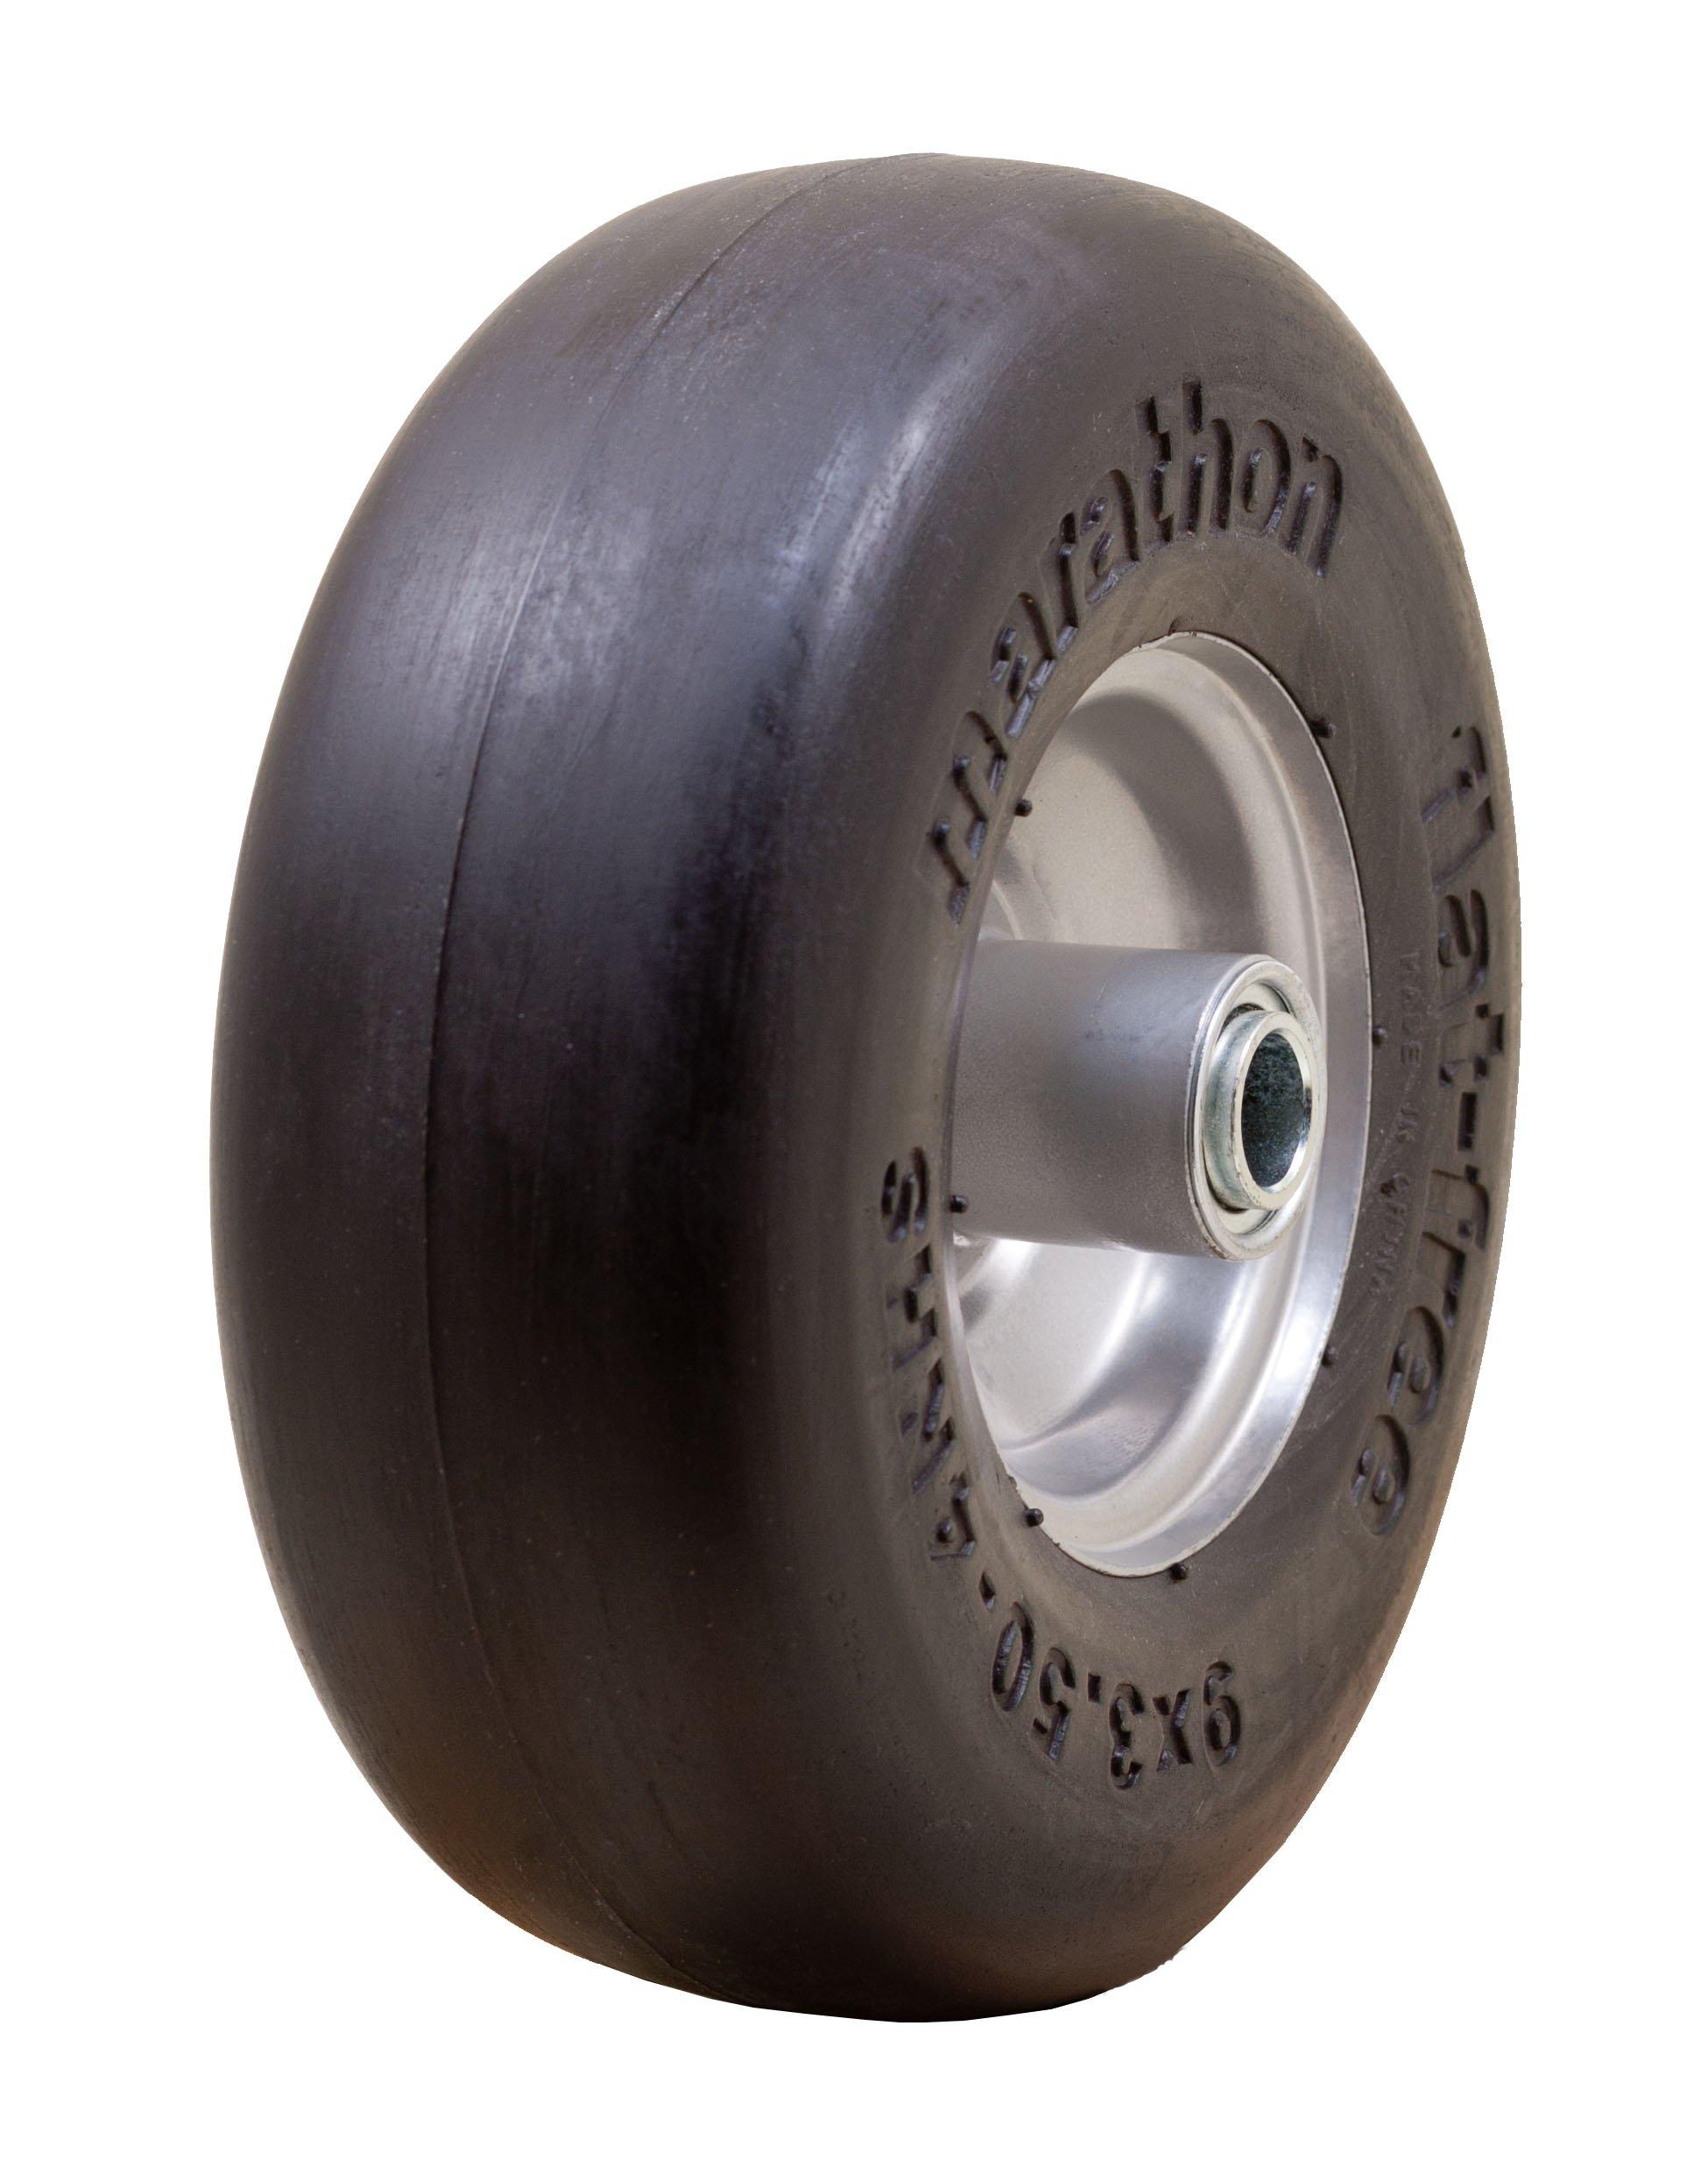 "Marathon 9x3.50-4"" Flat Free Tire on Wheel, 4"" Centered Hub, 3/4 Bushings"